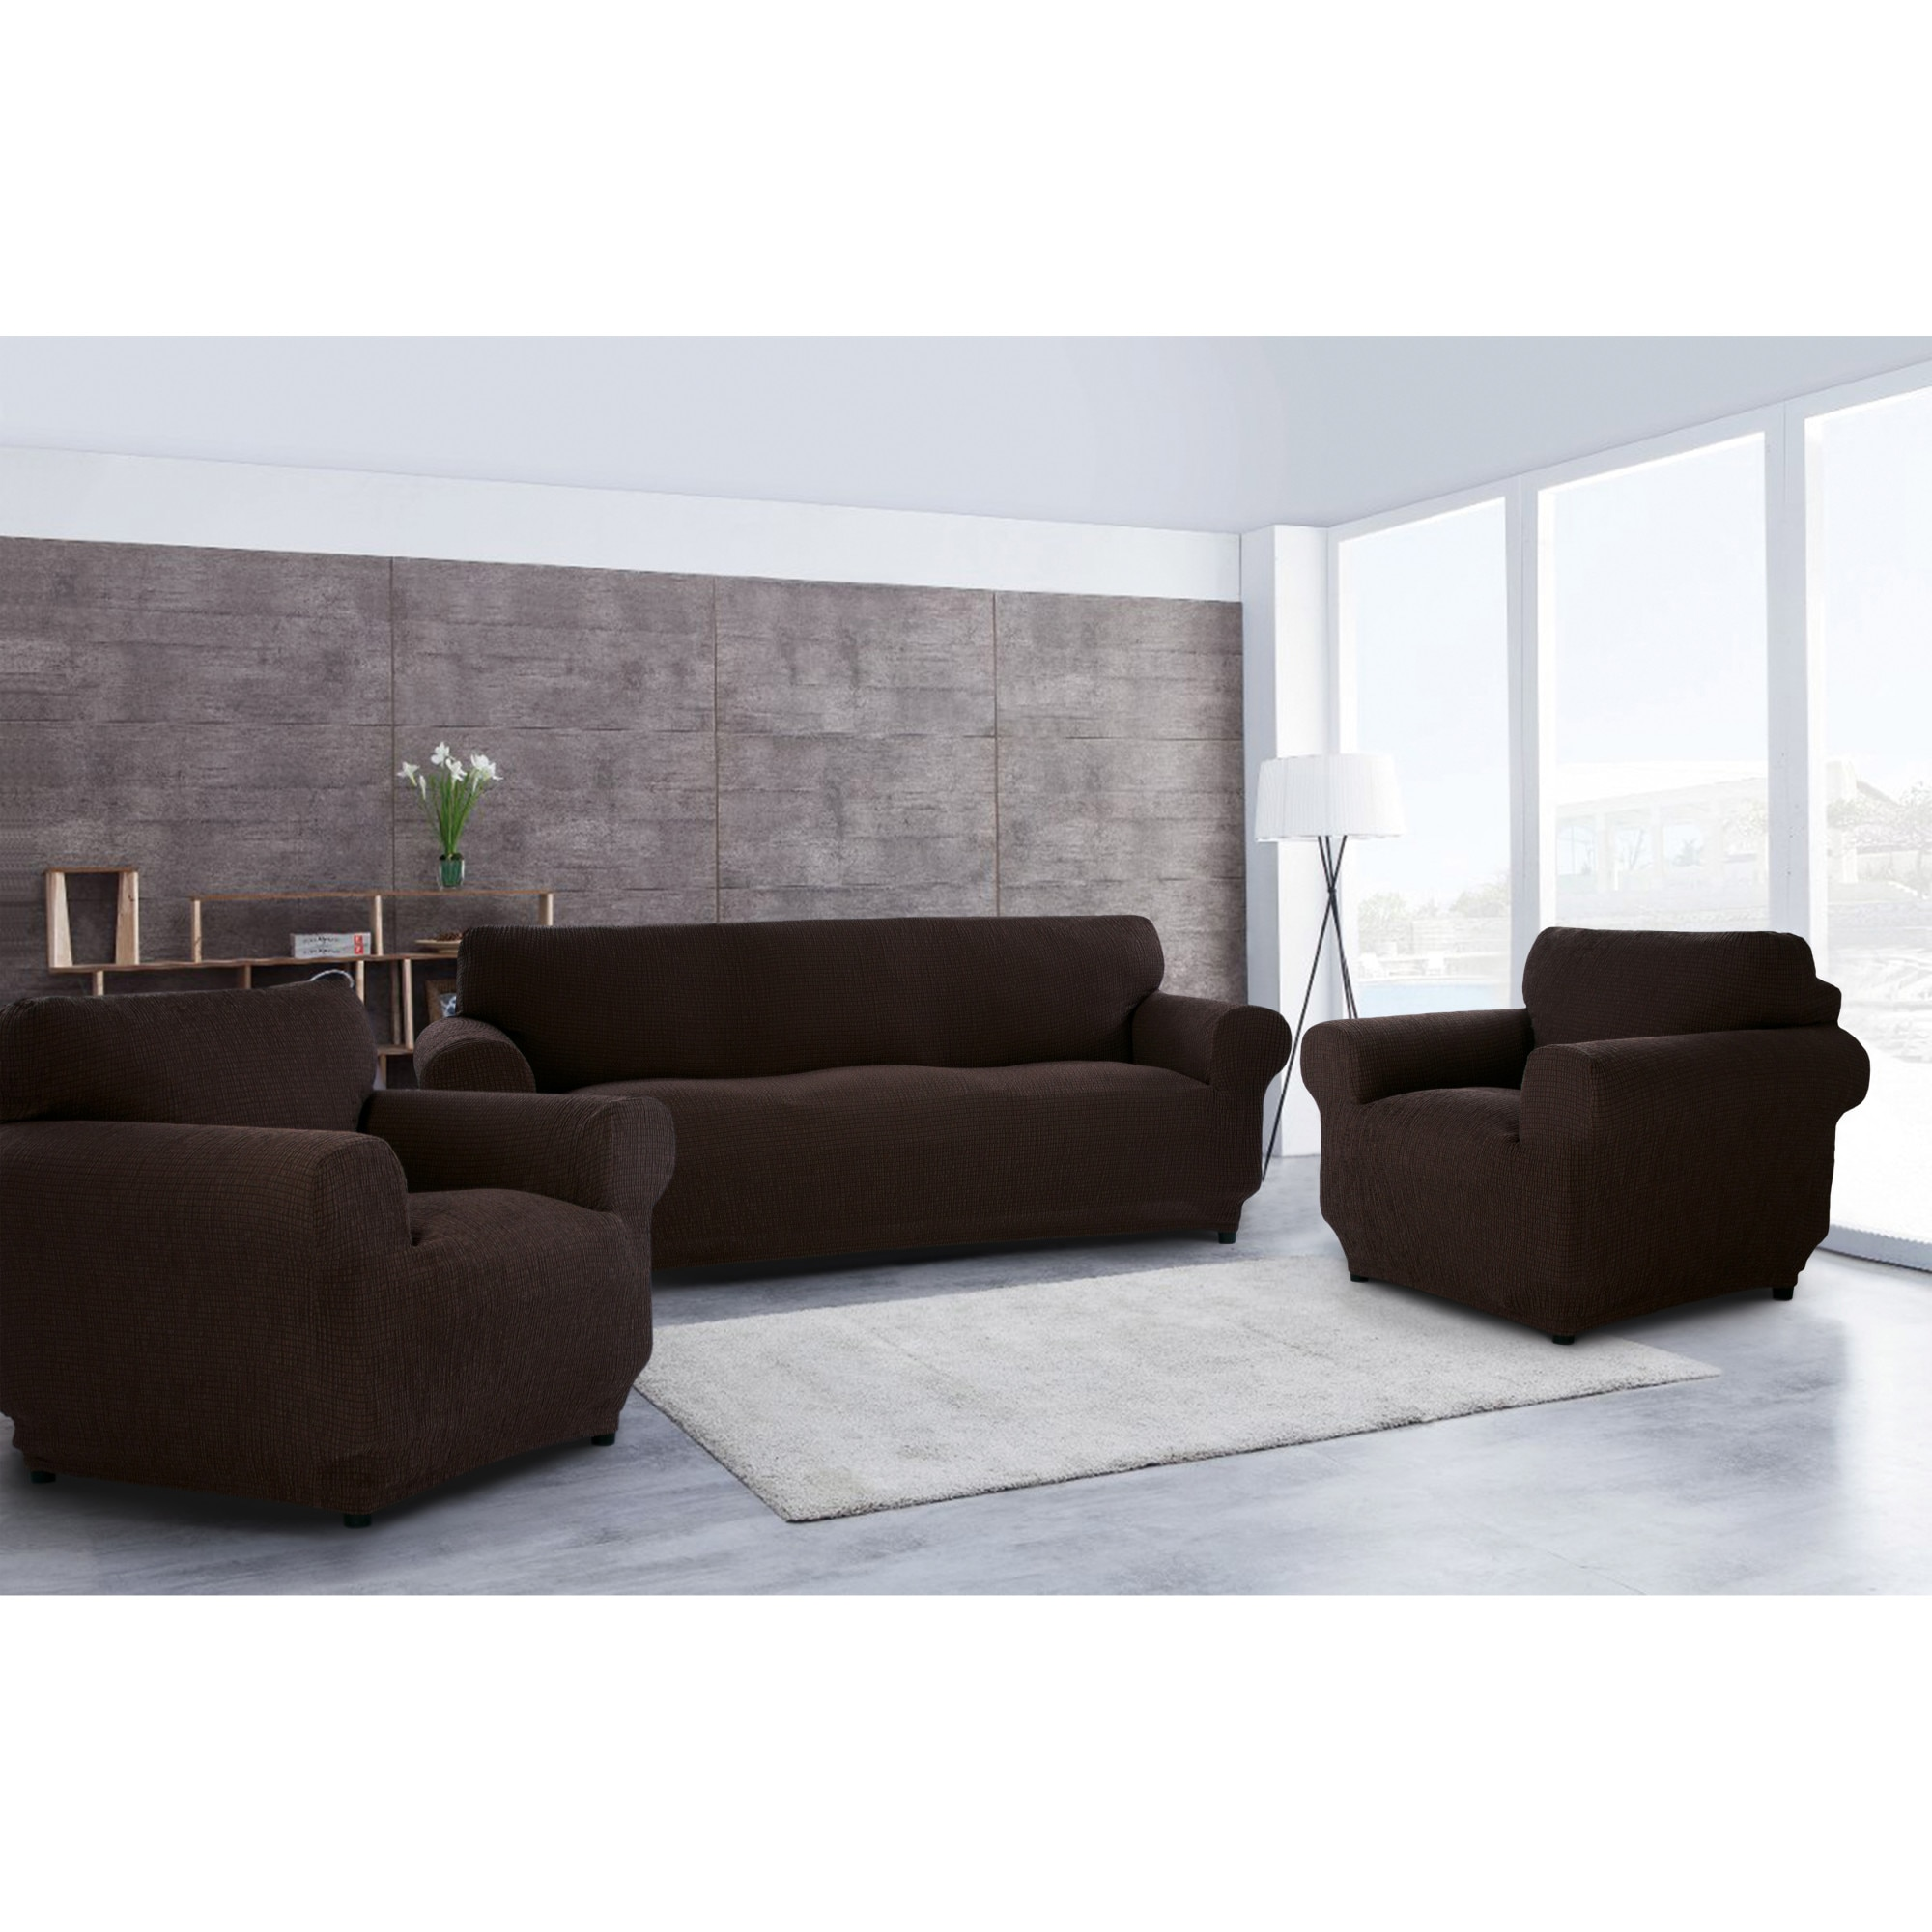 Fotografie Set huse elastice pentru canapea 3 locuri si 2 fotolii Kring Brilliante, 60% bumbac+ 35% poliester + 5% elastan, Maro inchis